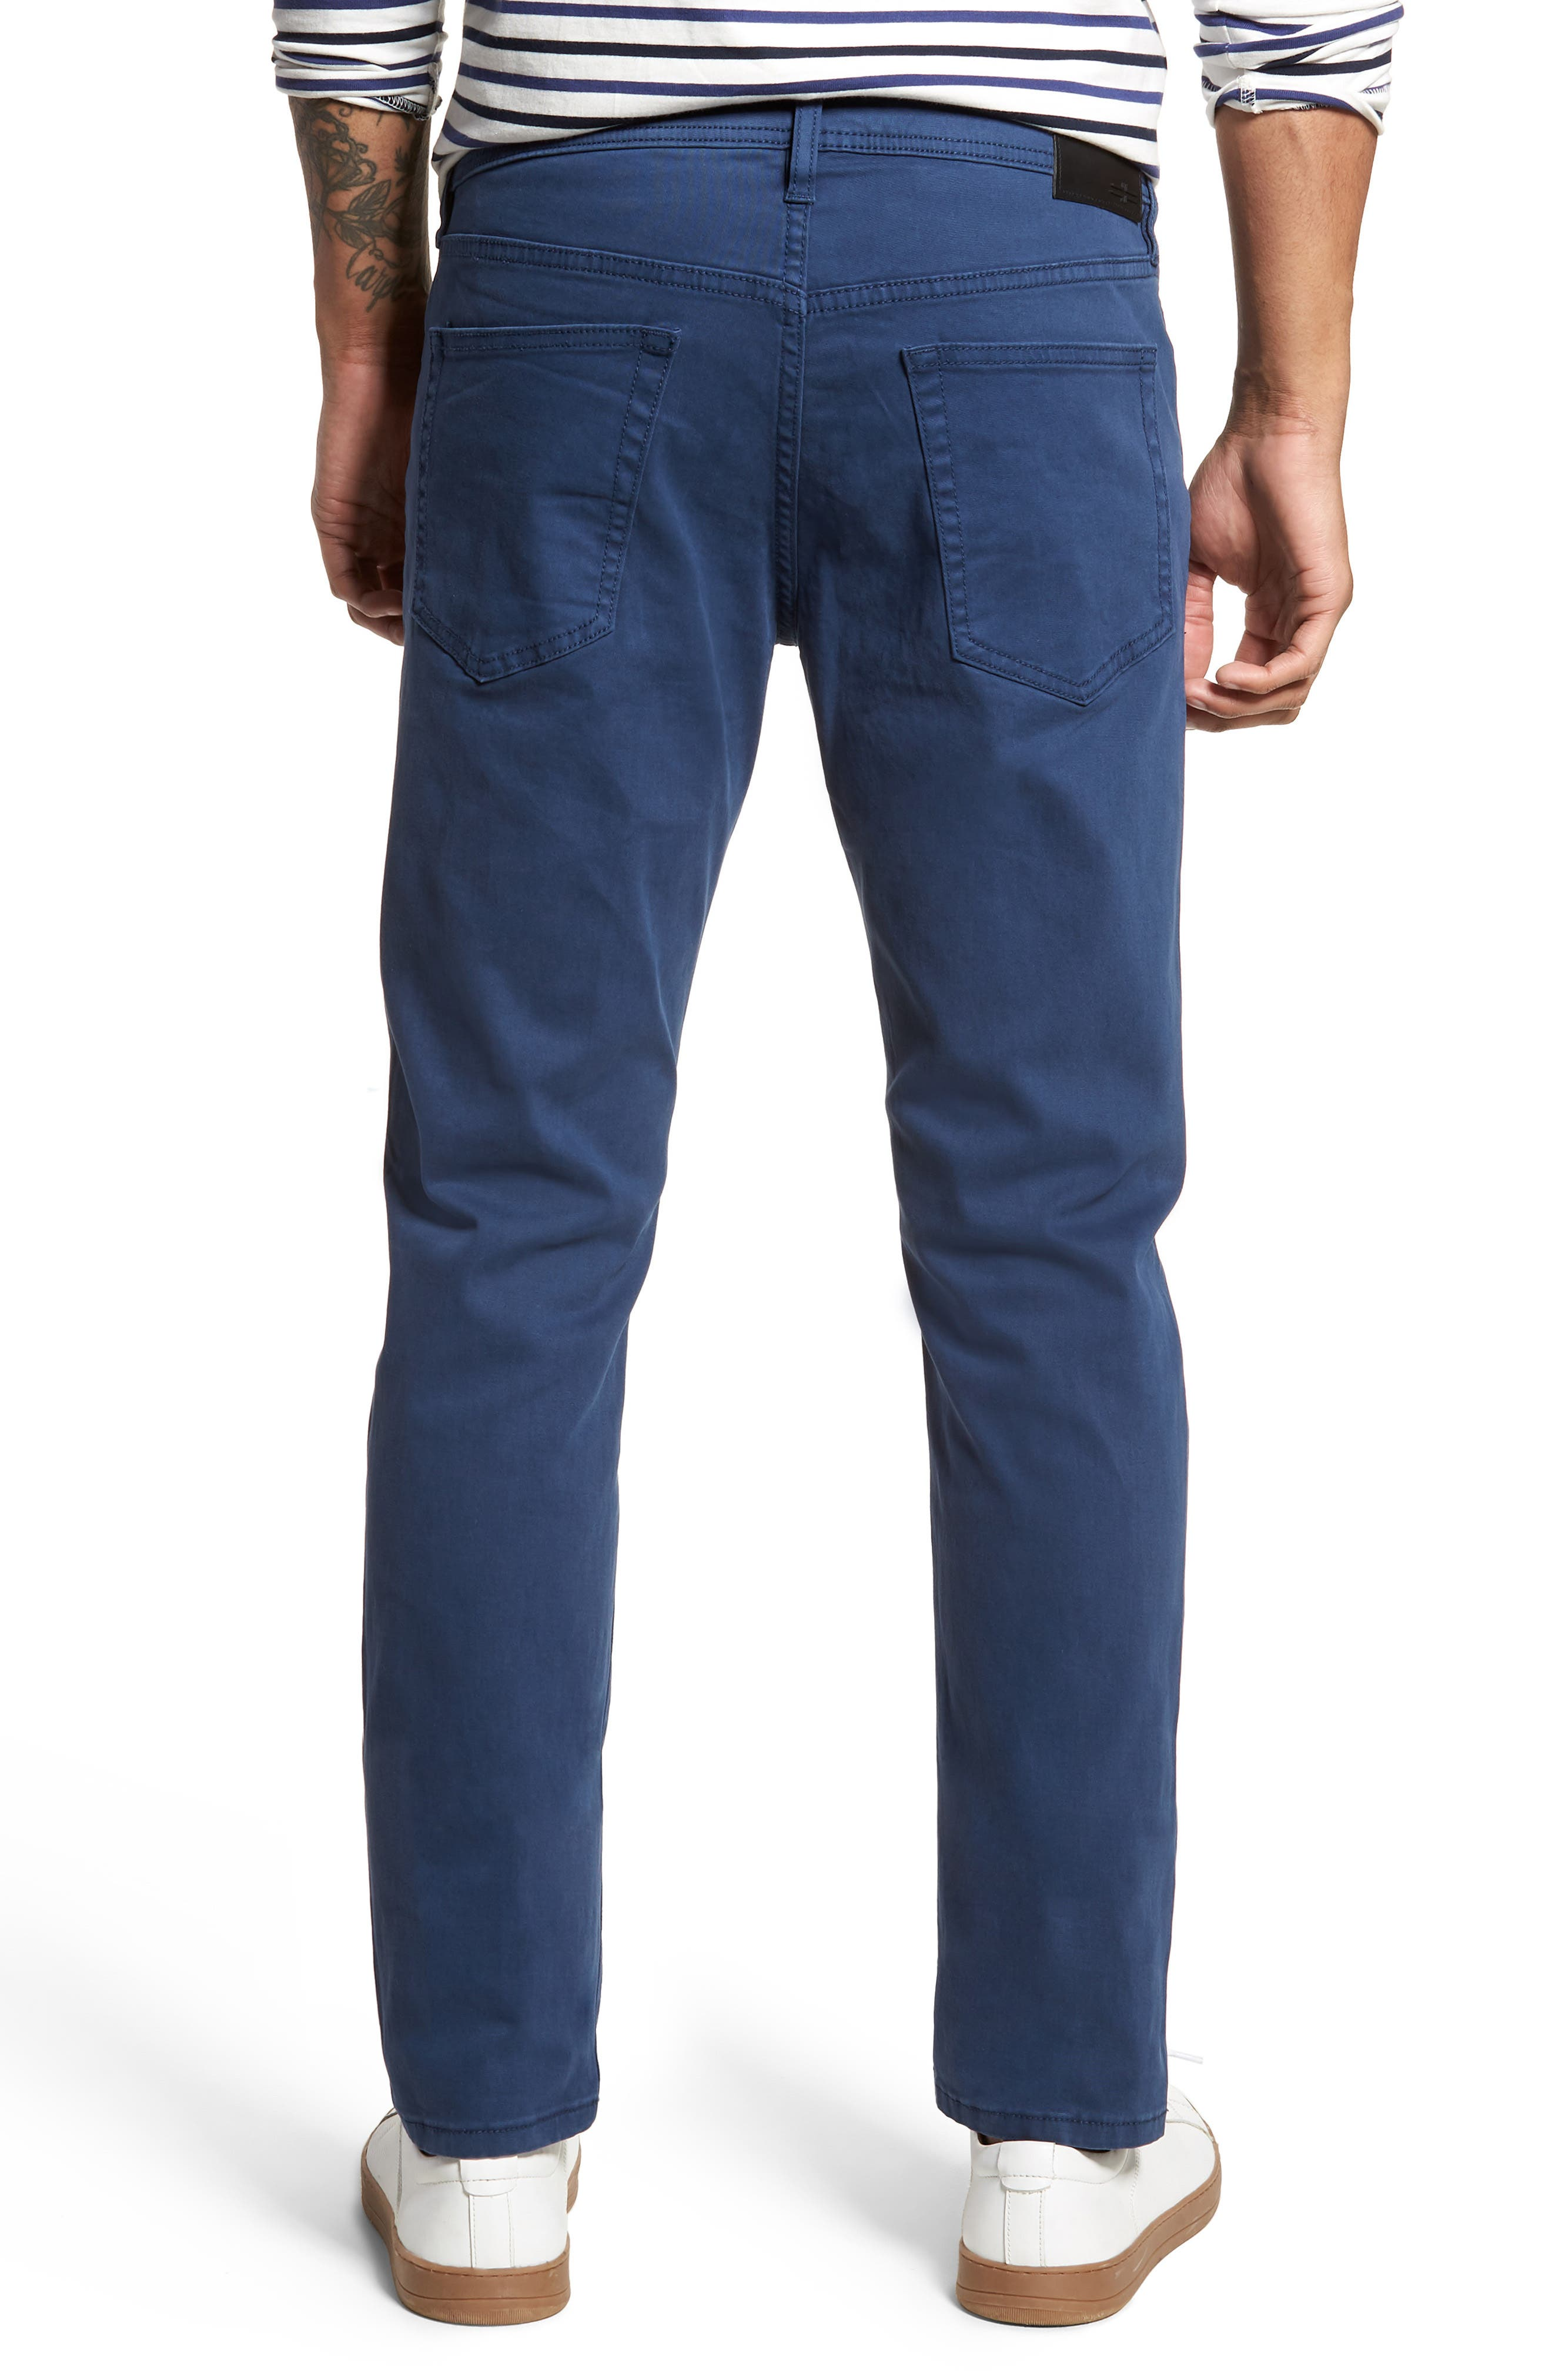 Jeans Co. Kingston Slim Straight Leg Jeans,                             Alternate thumbnail 2, color,                             BLUE TWILIGHT